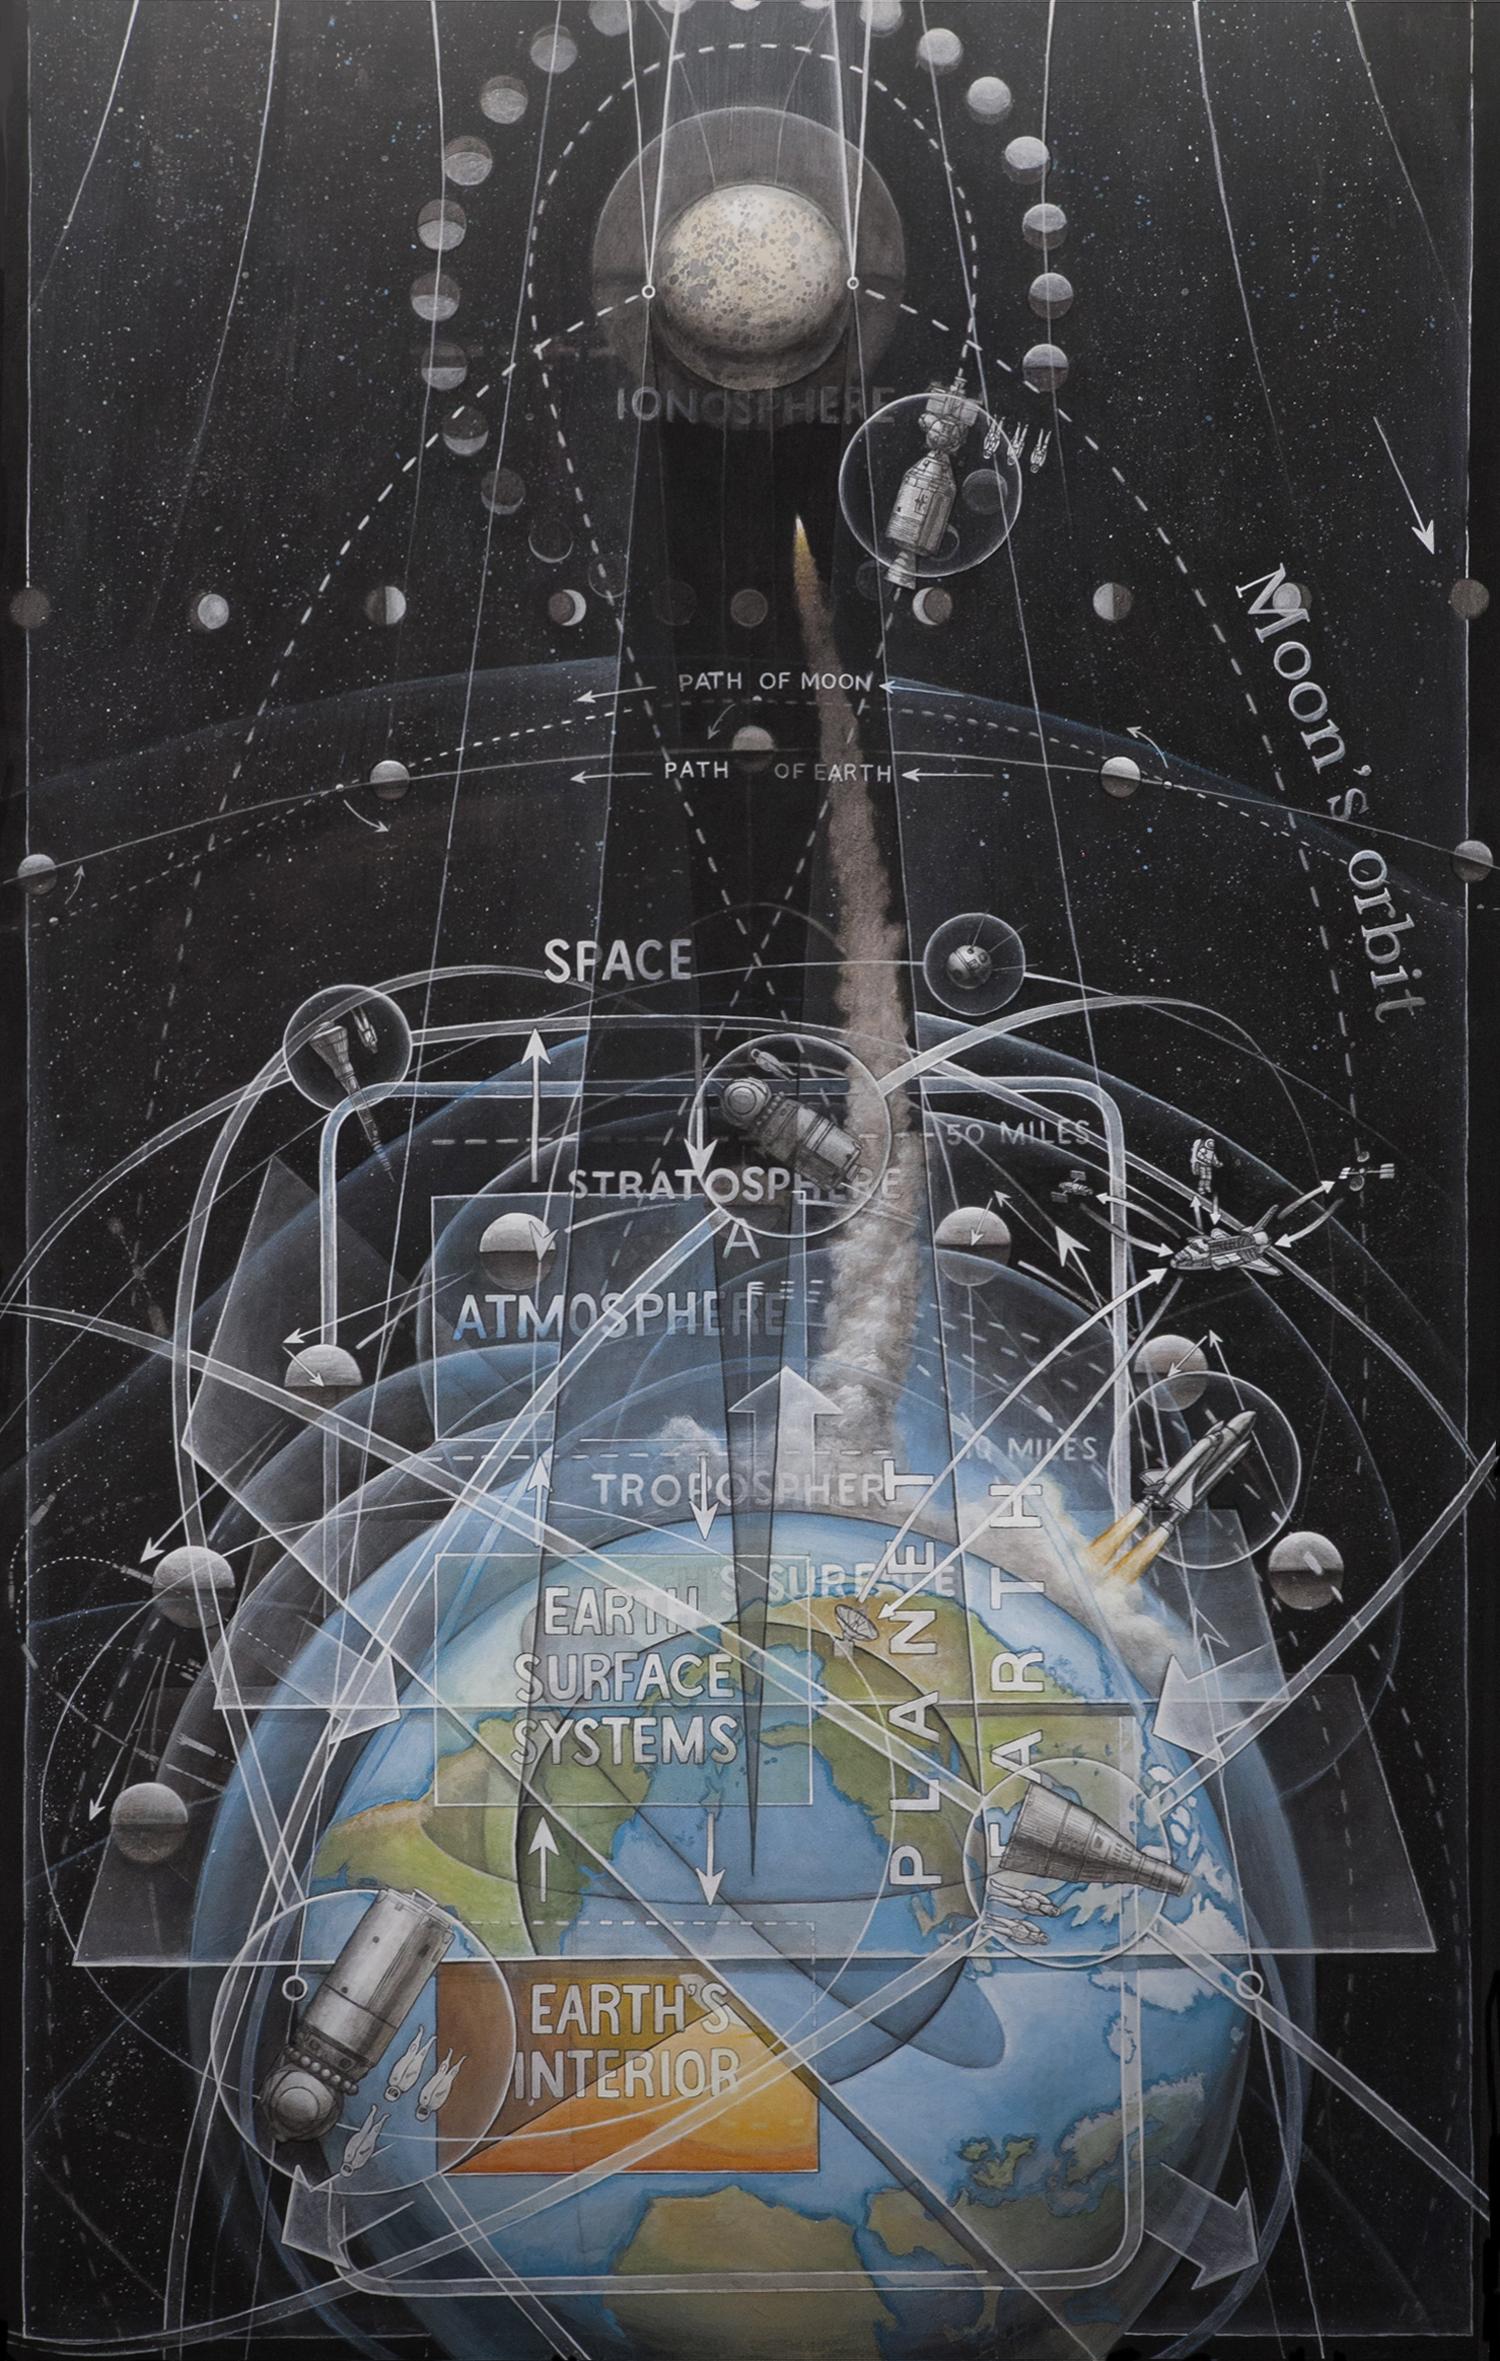 space-exploration-v-1-3-casey-cripe.jpg